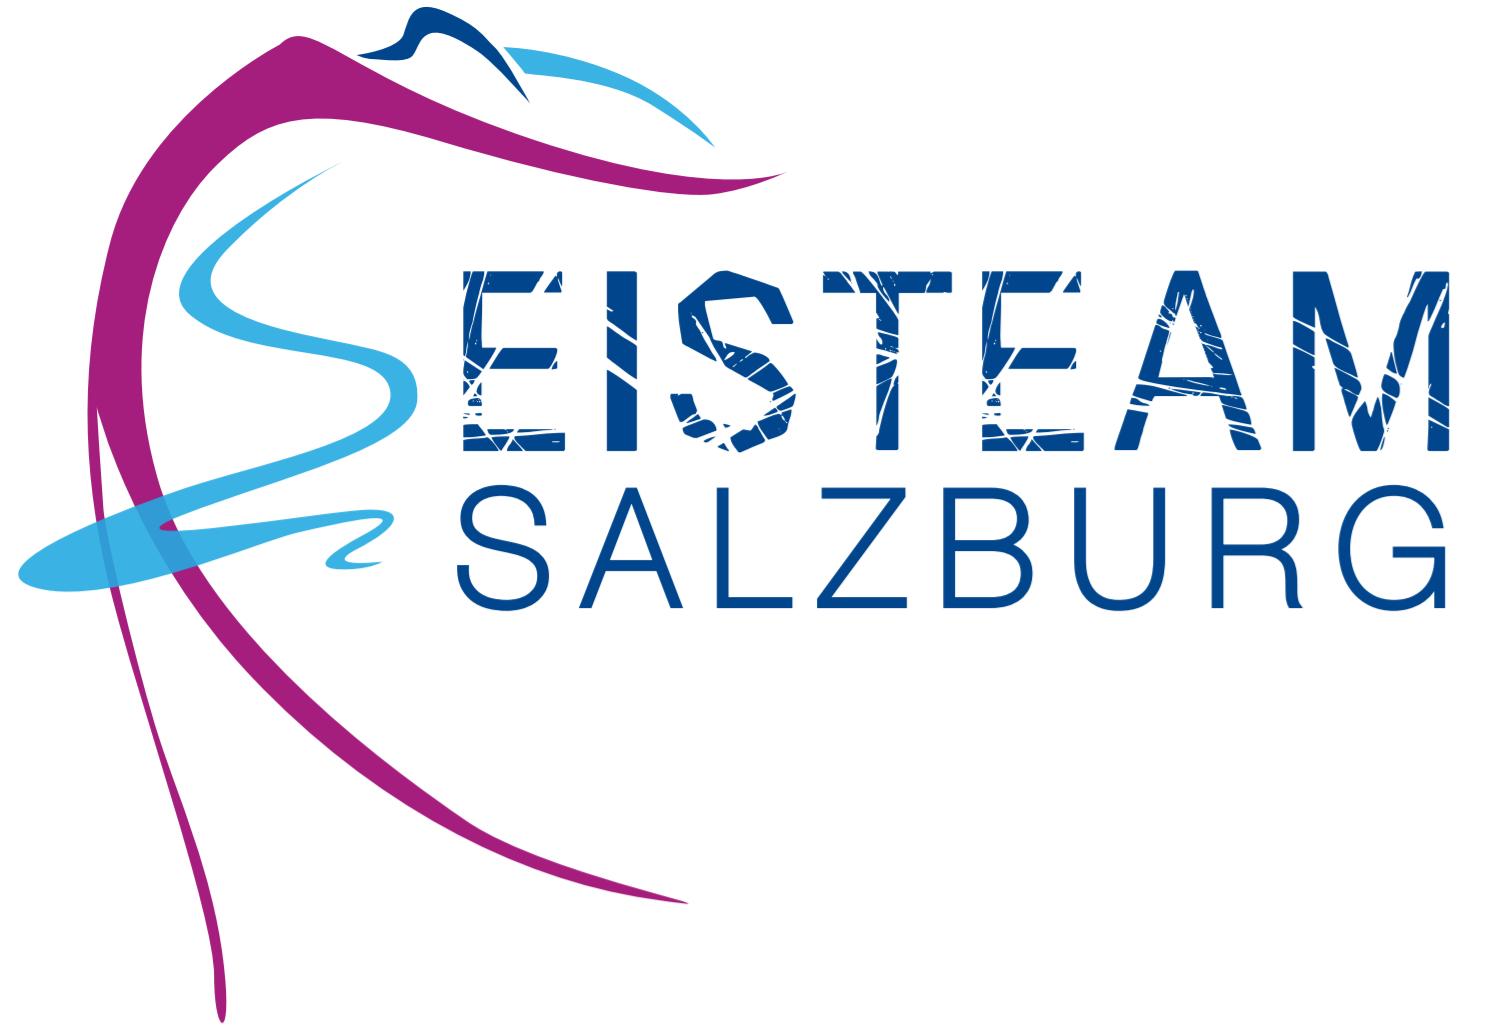 Eisteam Salzburg